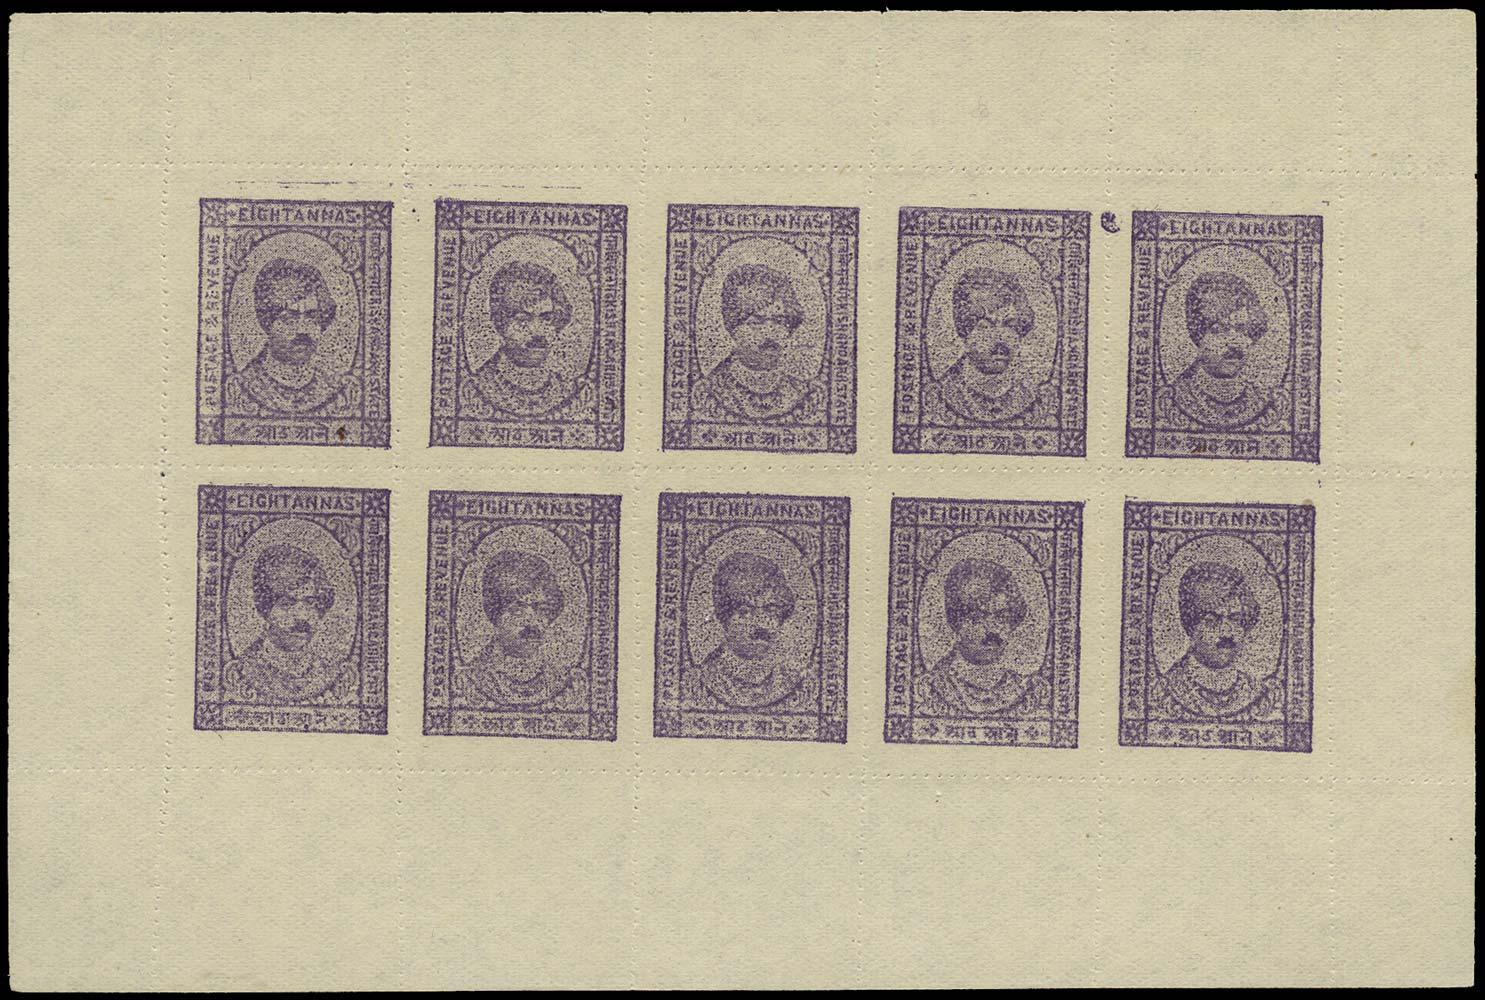 I.F.S. KISHANGARH 1943  SG89 Mint 8a violet pin perf